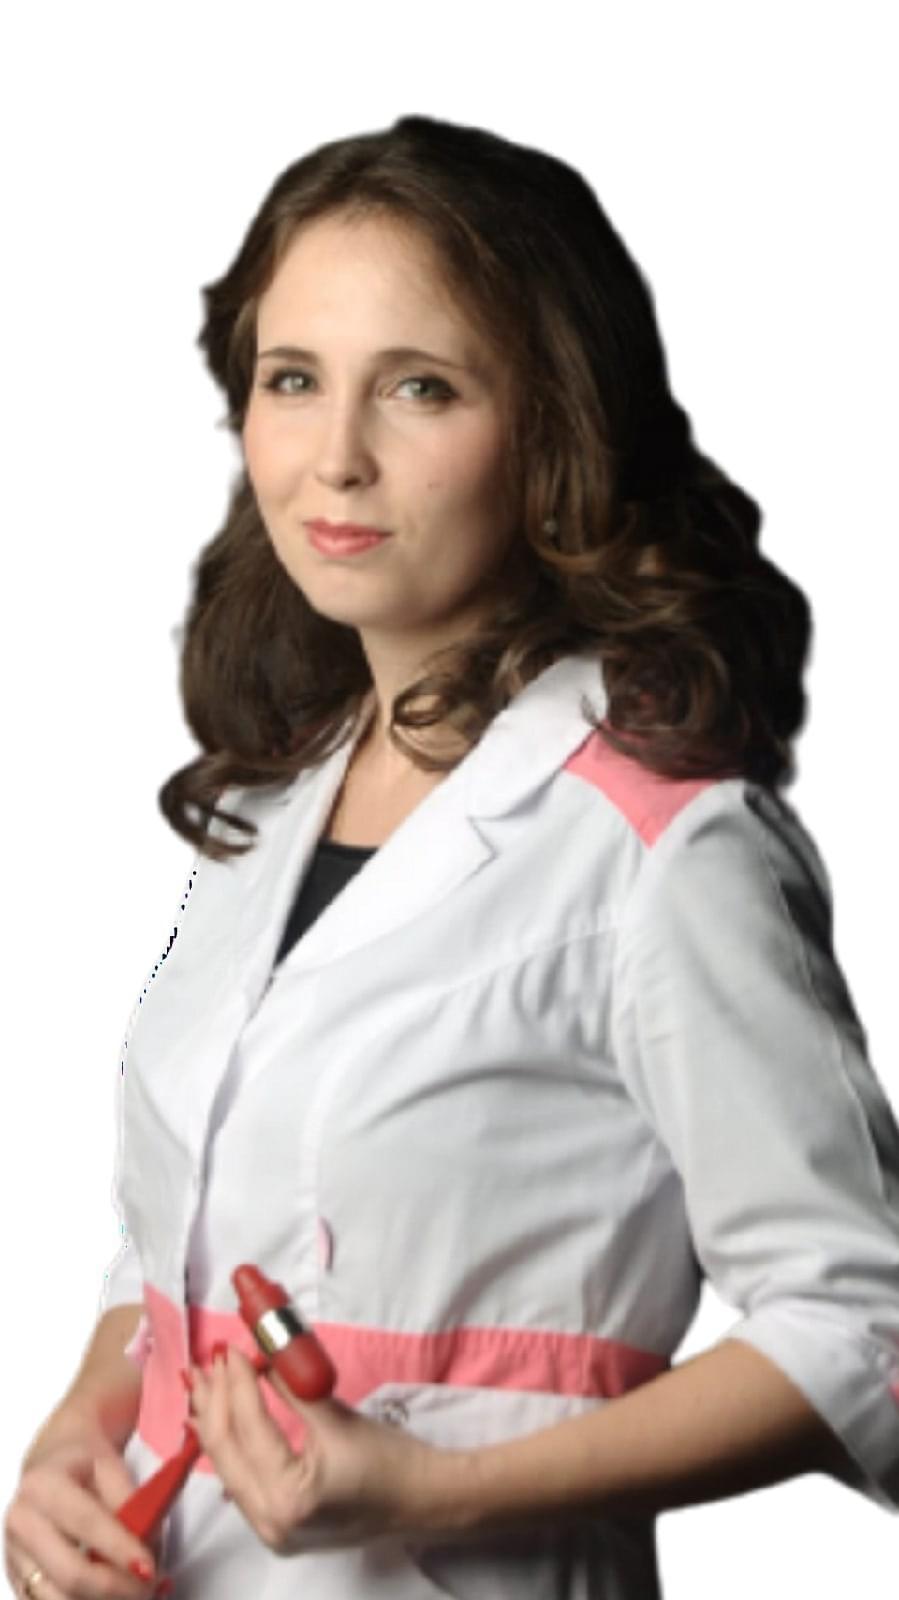 Ионова Наталия Александровна : Врач невролог